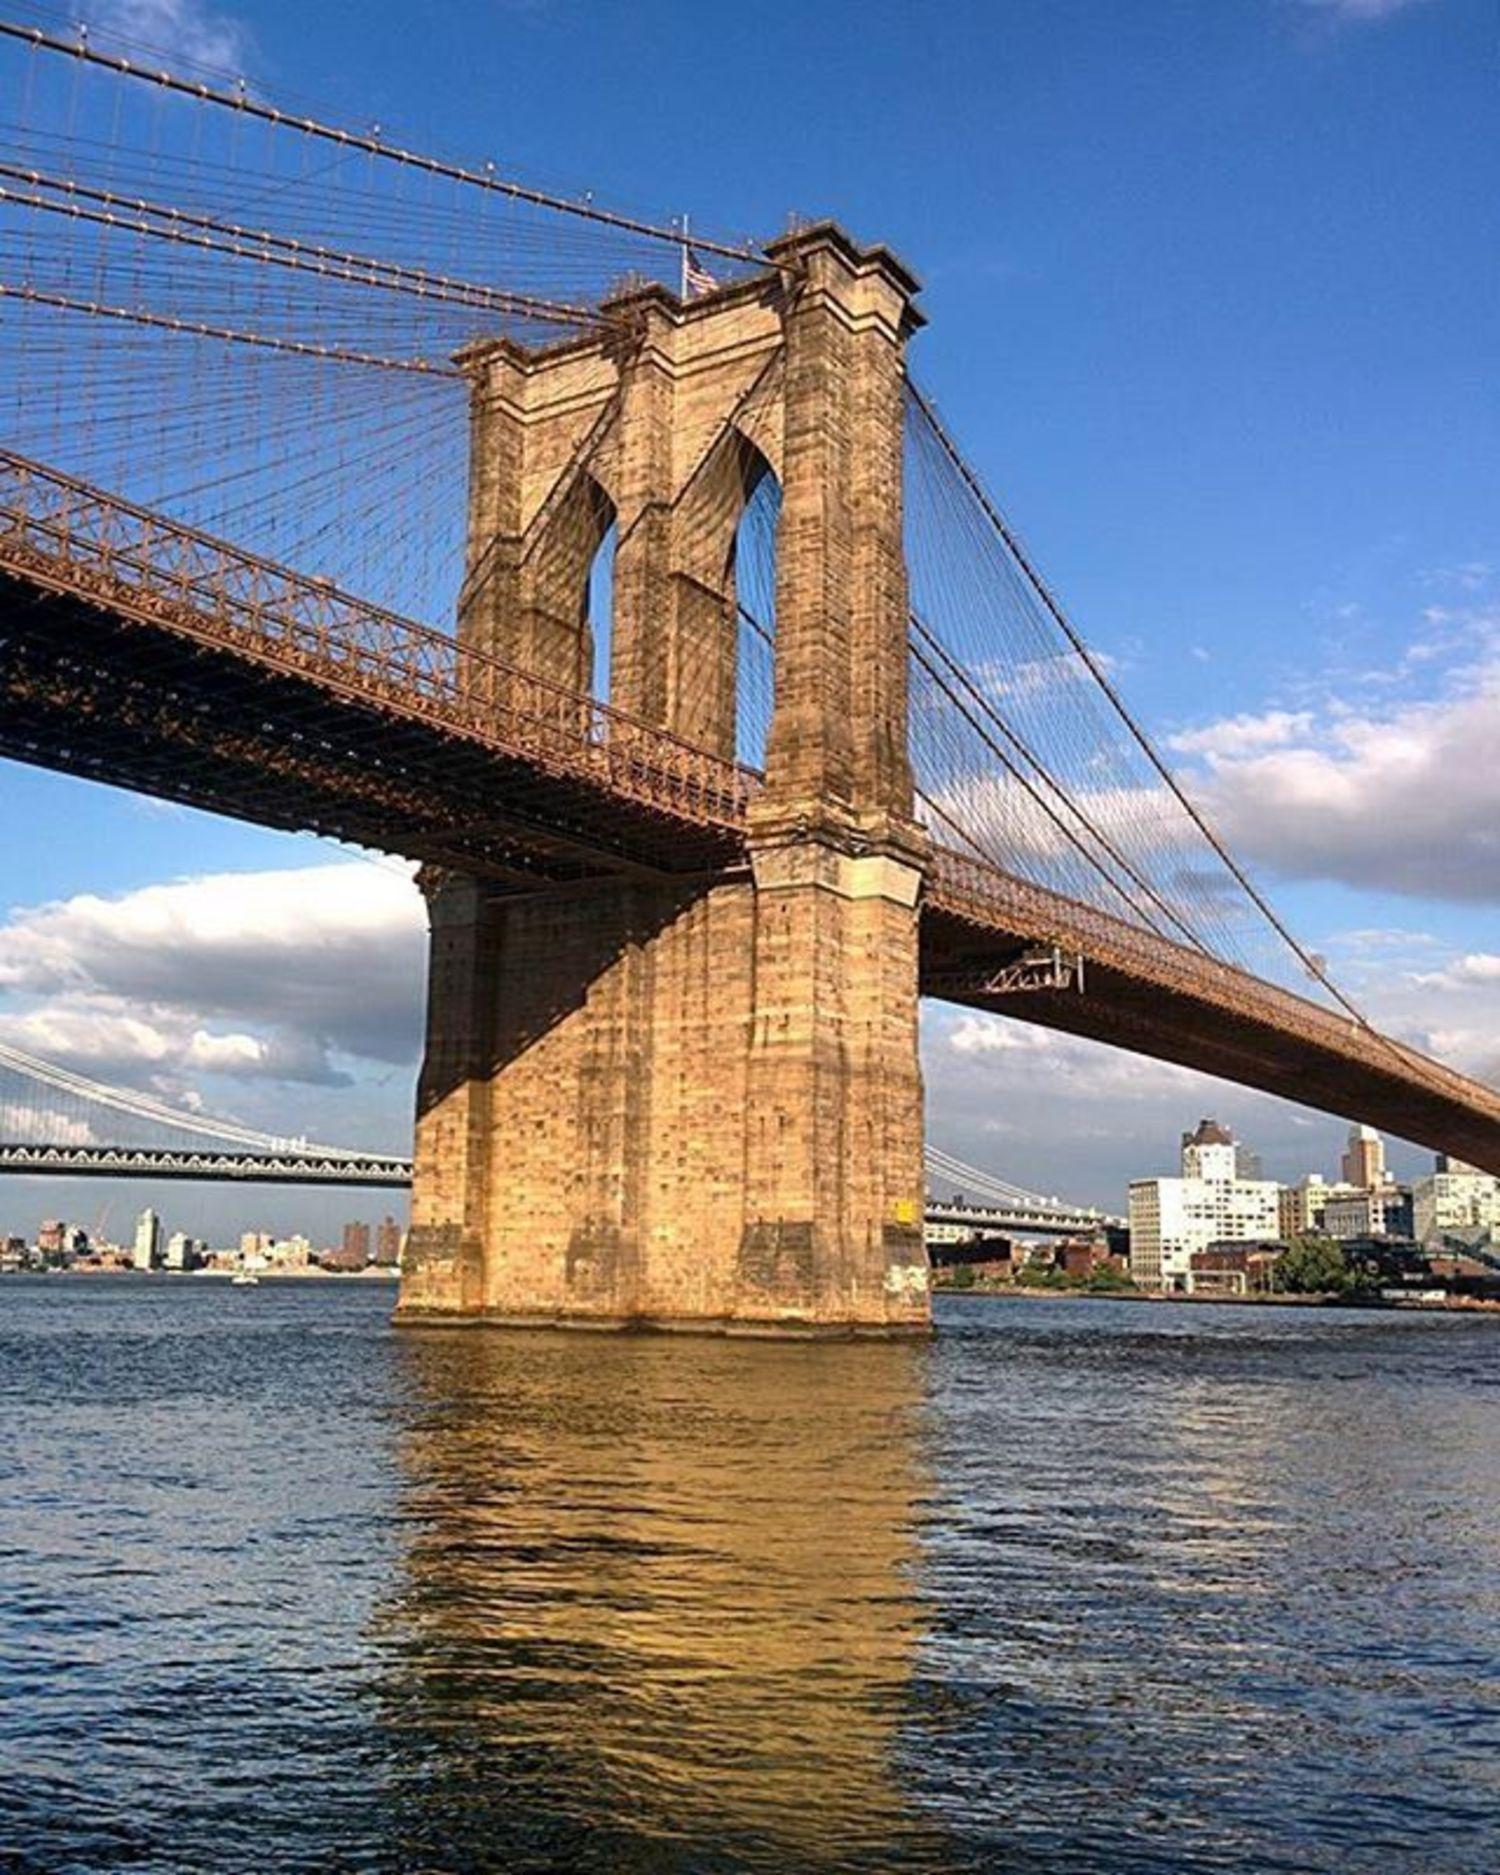 Brooklyn Bridge, New York. Photo via @orbit.er #viewingnyc #newyorkcity #newyork